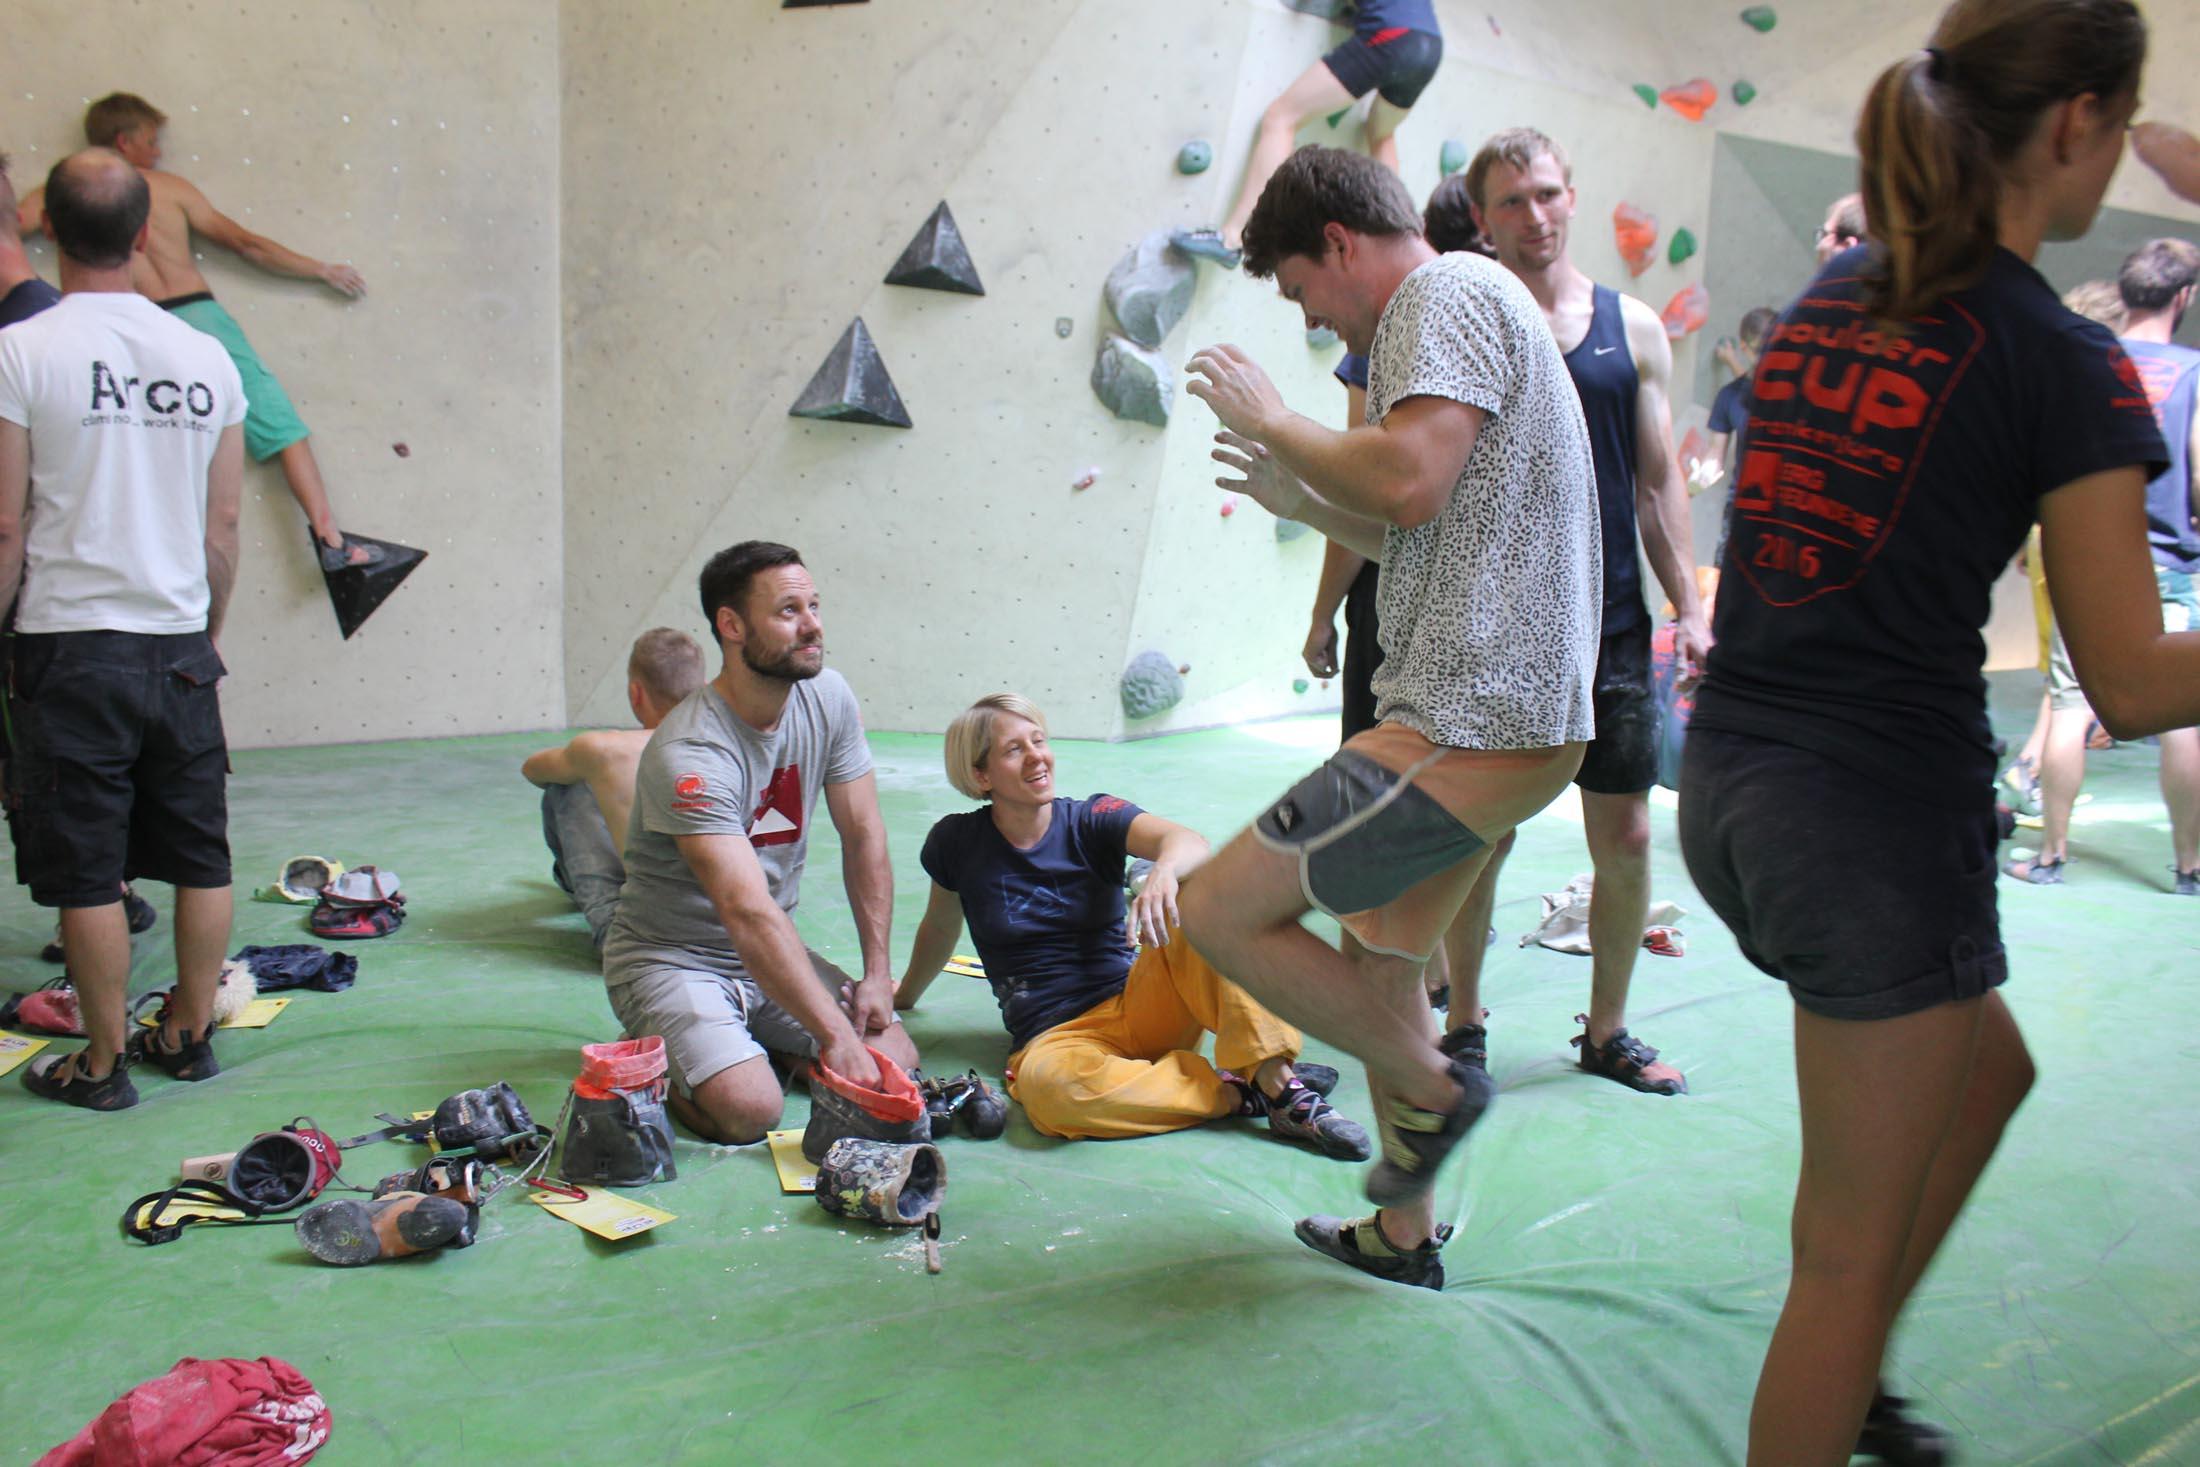 Quali, internationaler bouldercup Frankenjura 2016, BLOCKHELDEN Erlangen, Mammut, Bergfreunde.de, Boulderwettkampf07092016317